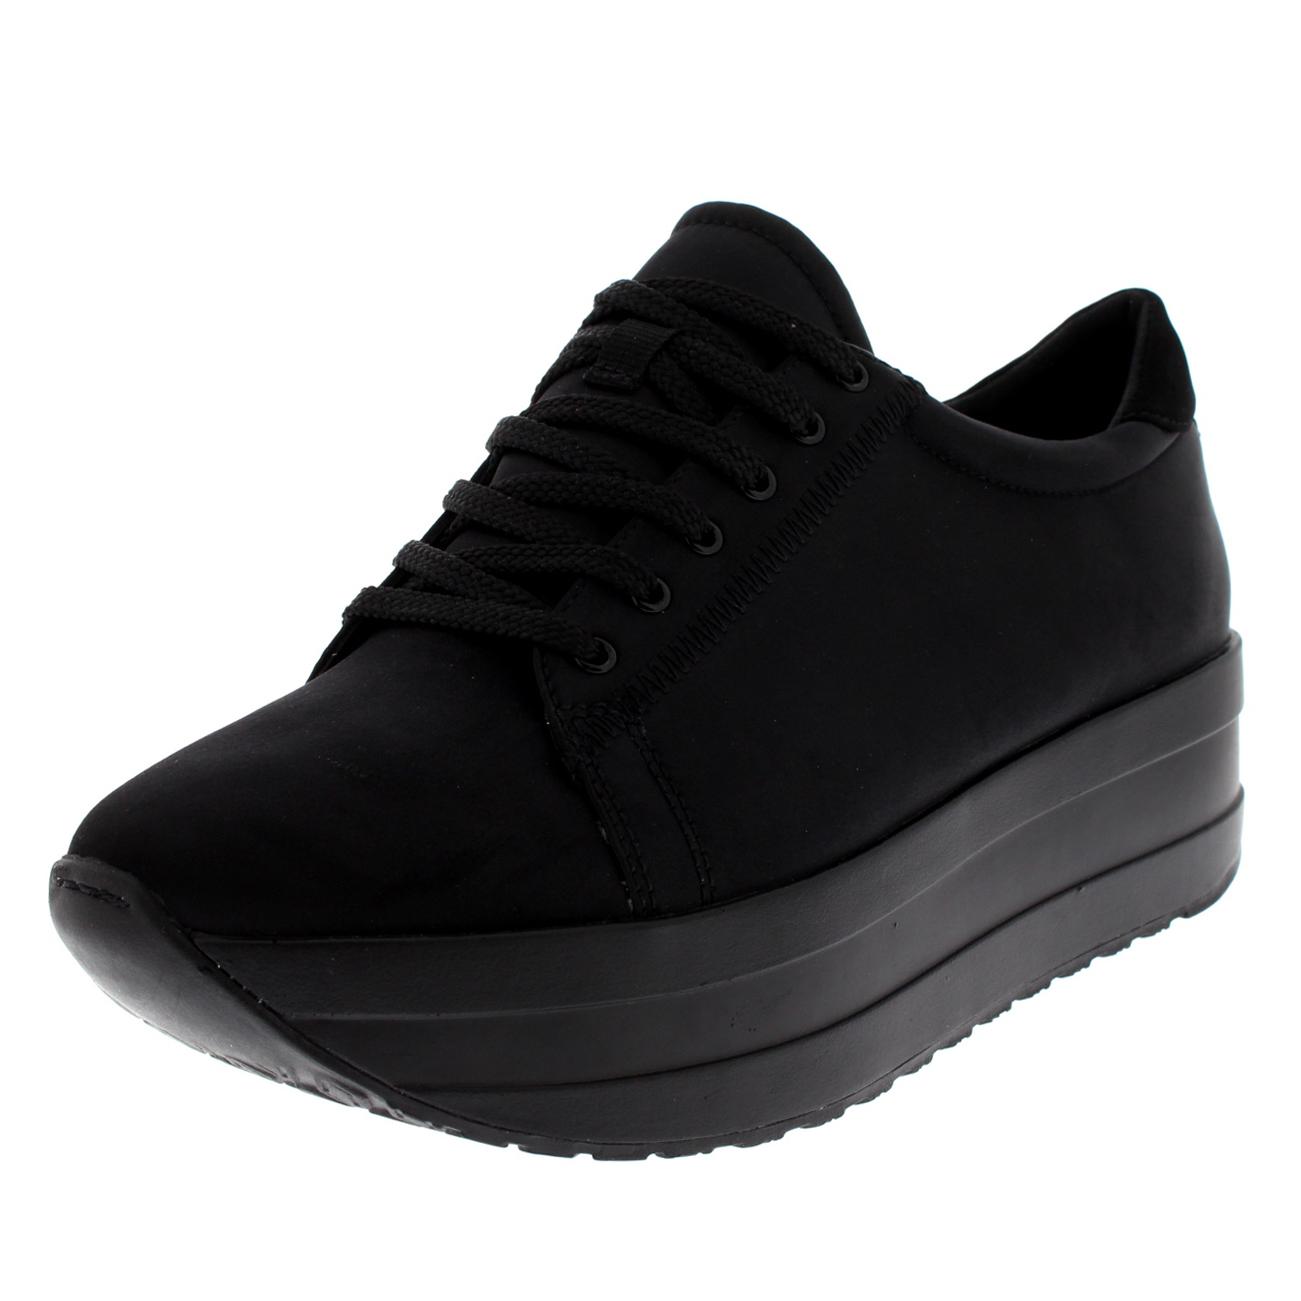 detailed look 3199e 9fac0 Womens-Vagabond-Casey-Black-Platform-Fashion-Wedge-Shiny-